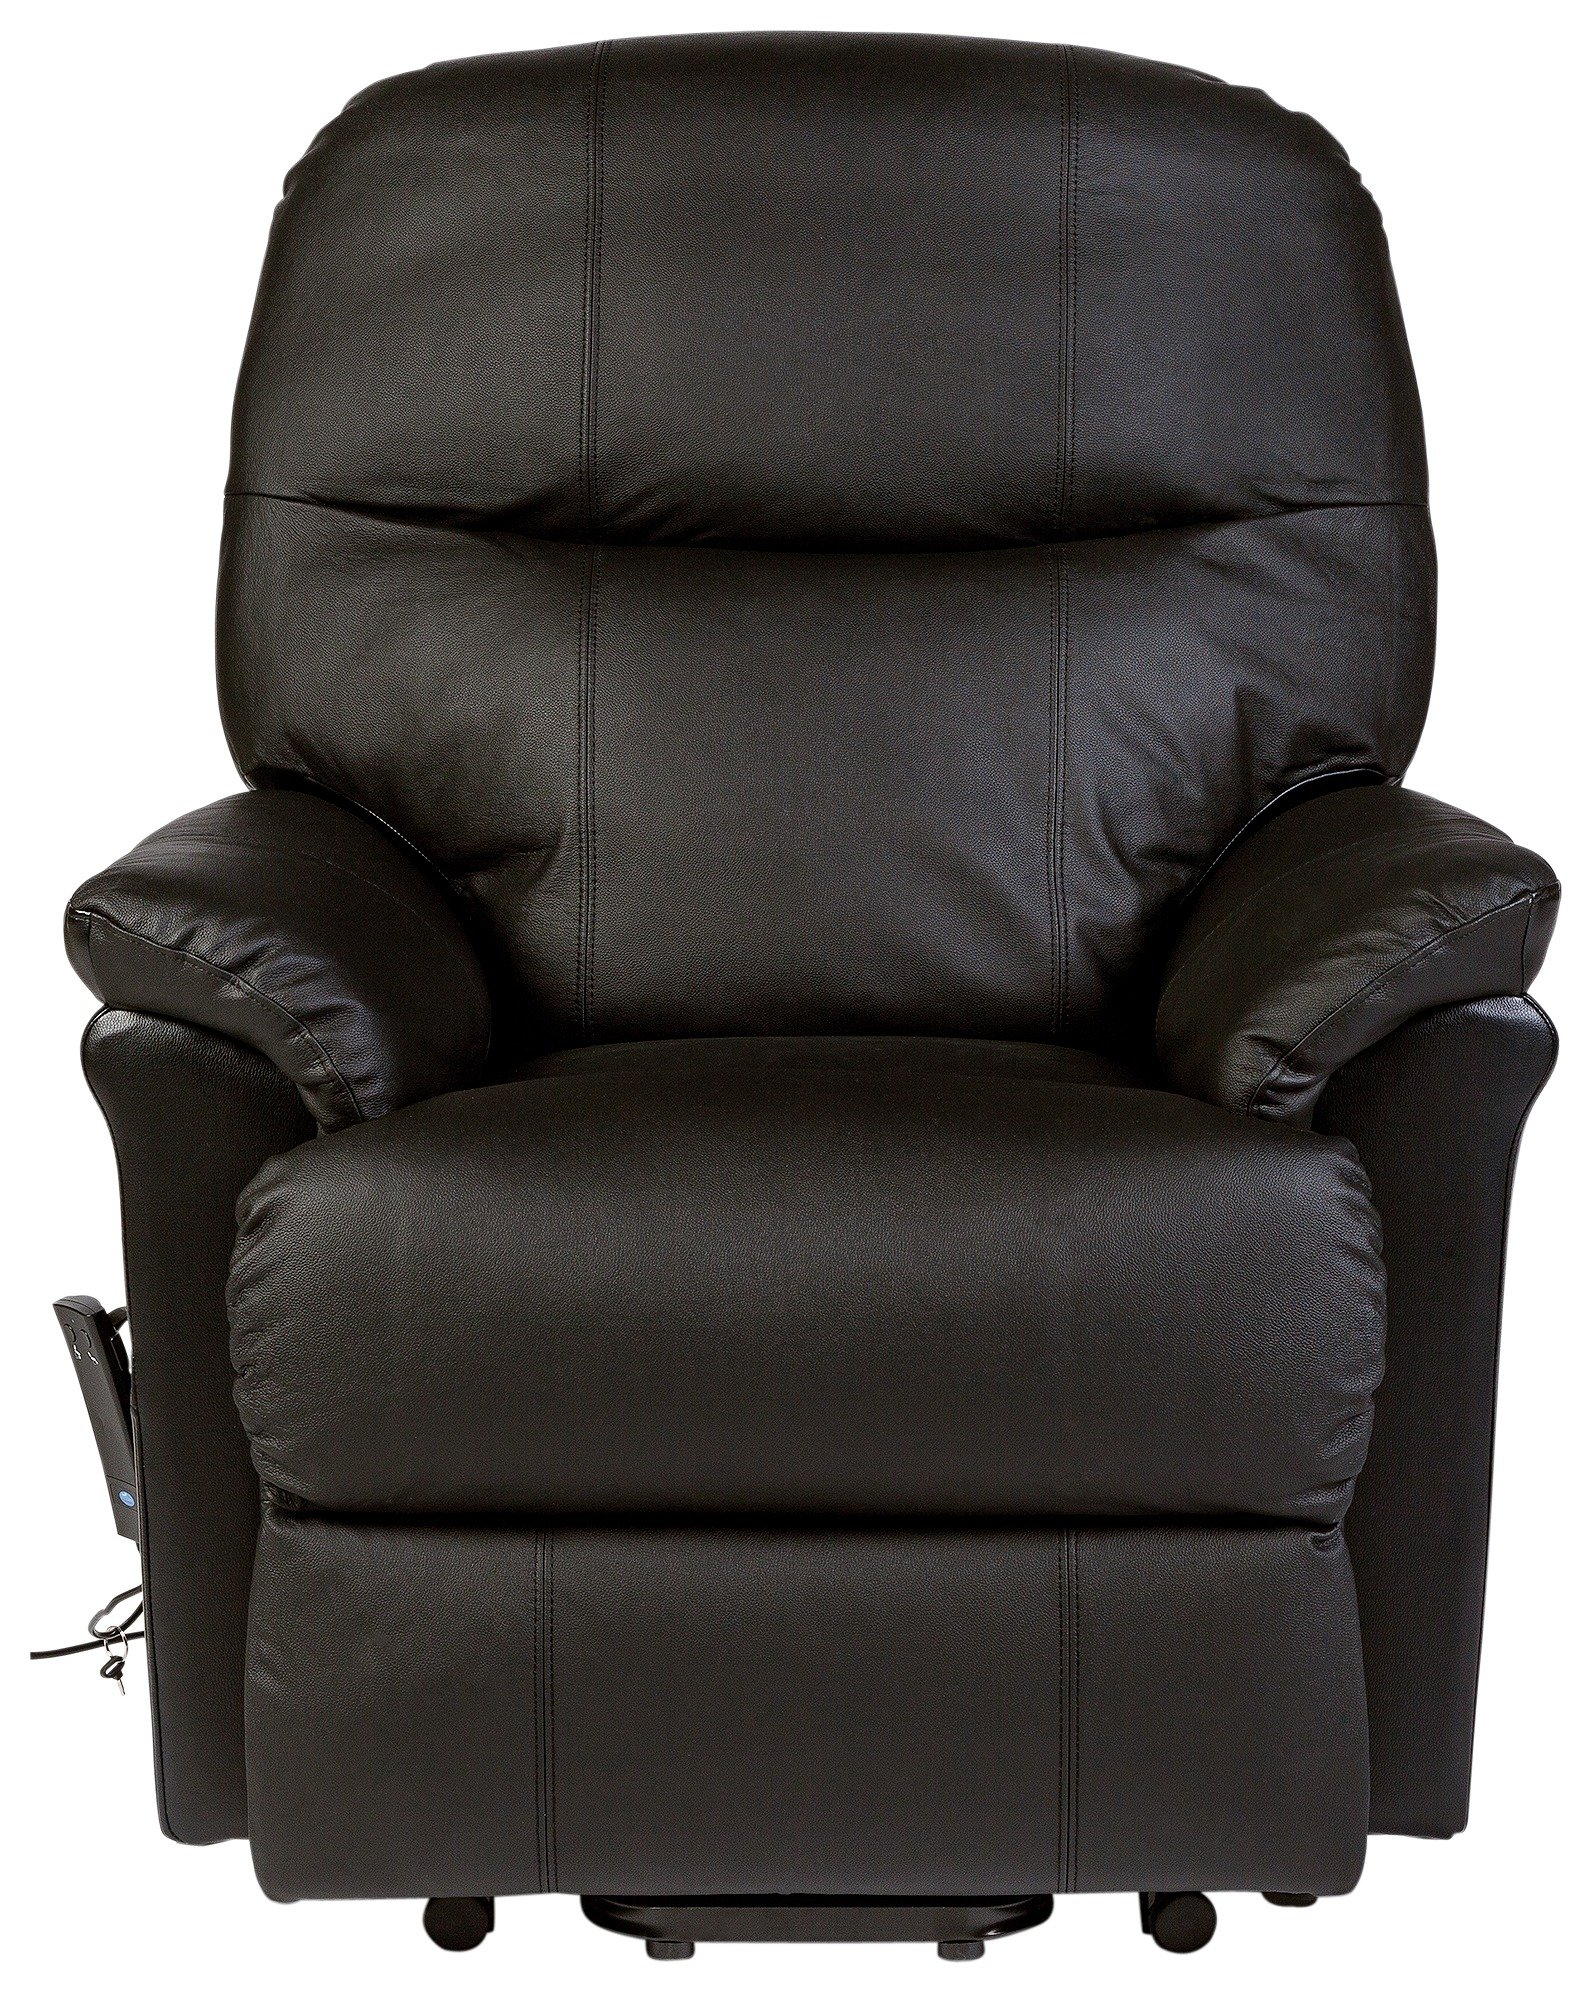 Lars Riser Recliner Single Motor Leather Chair -Dark Brown